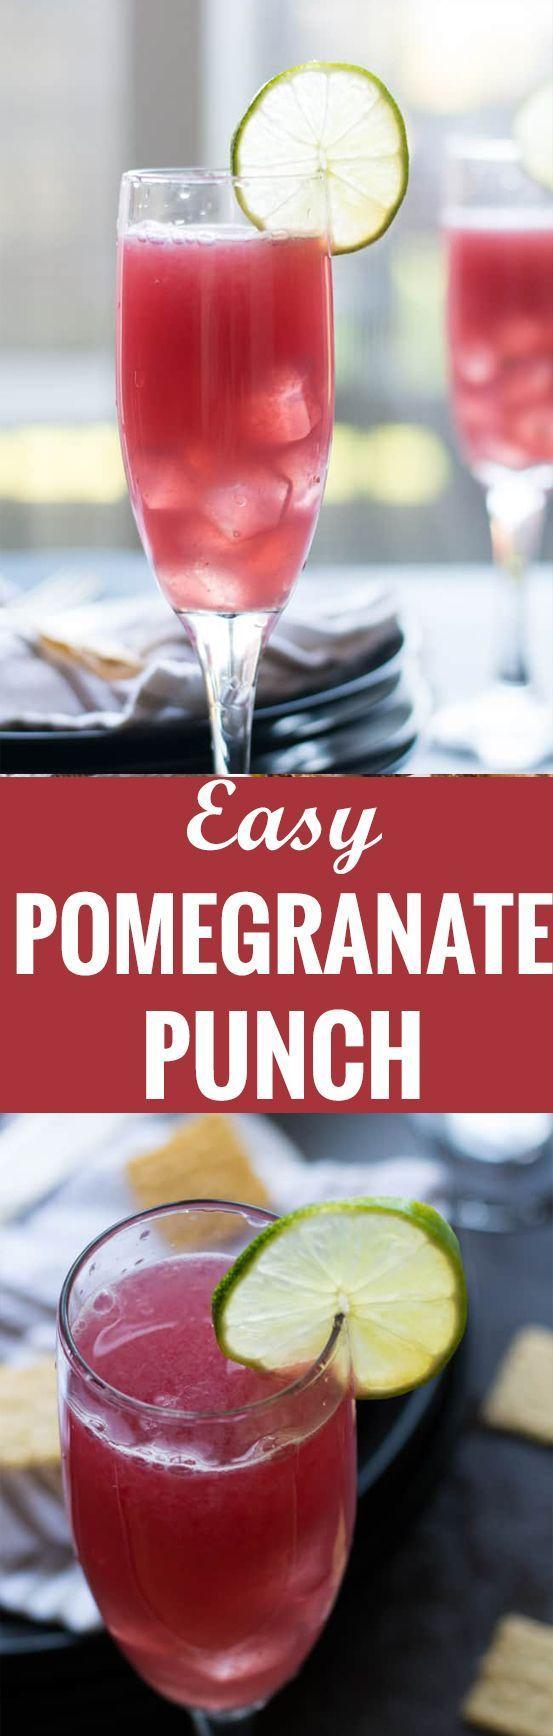 Unique Wedding Punch Recipes - Ourmarriage.com